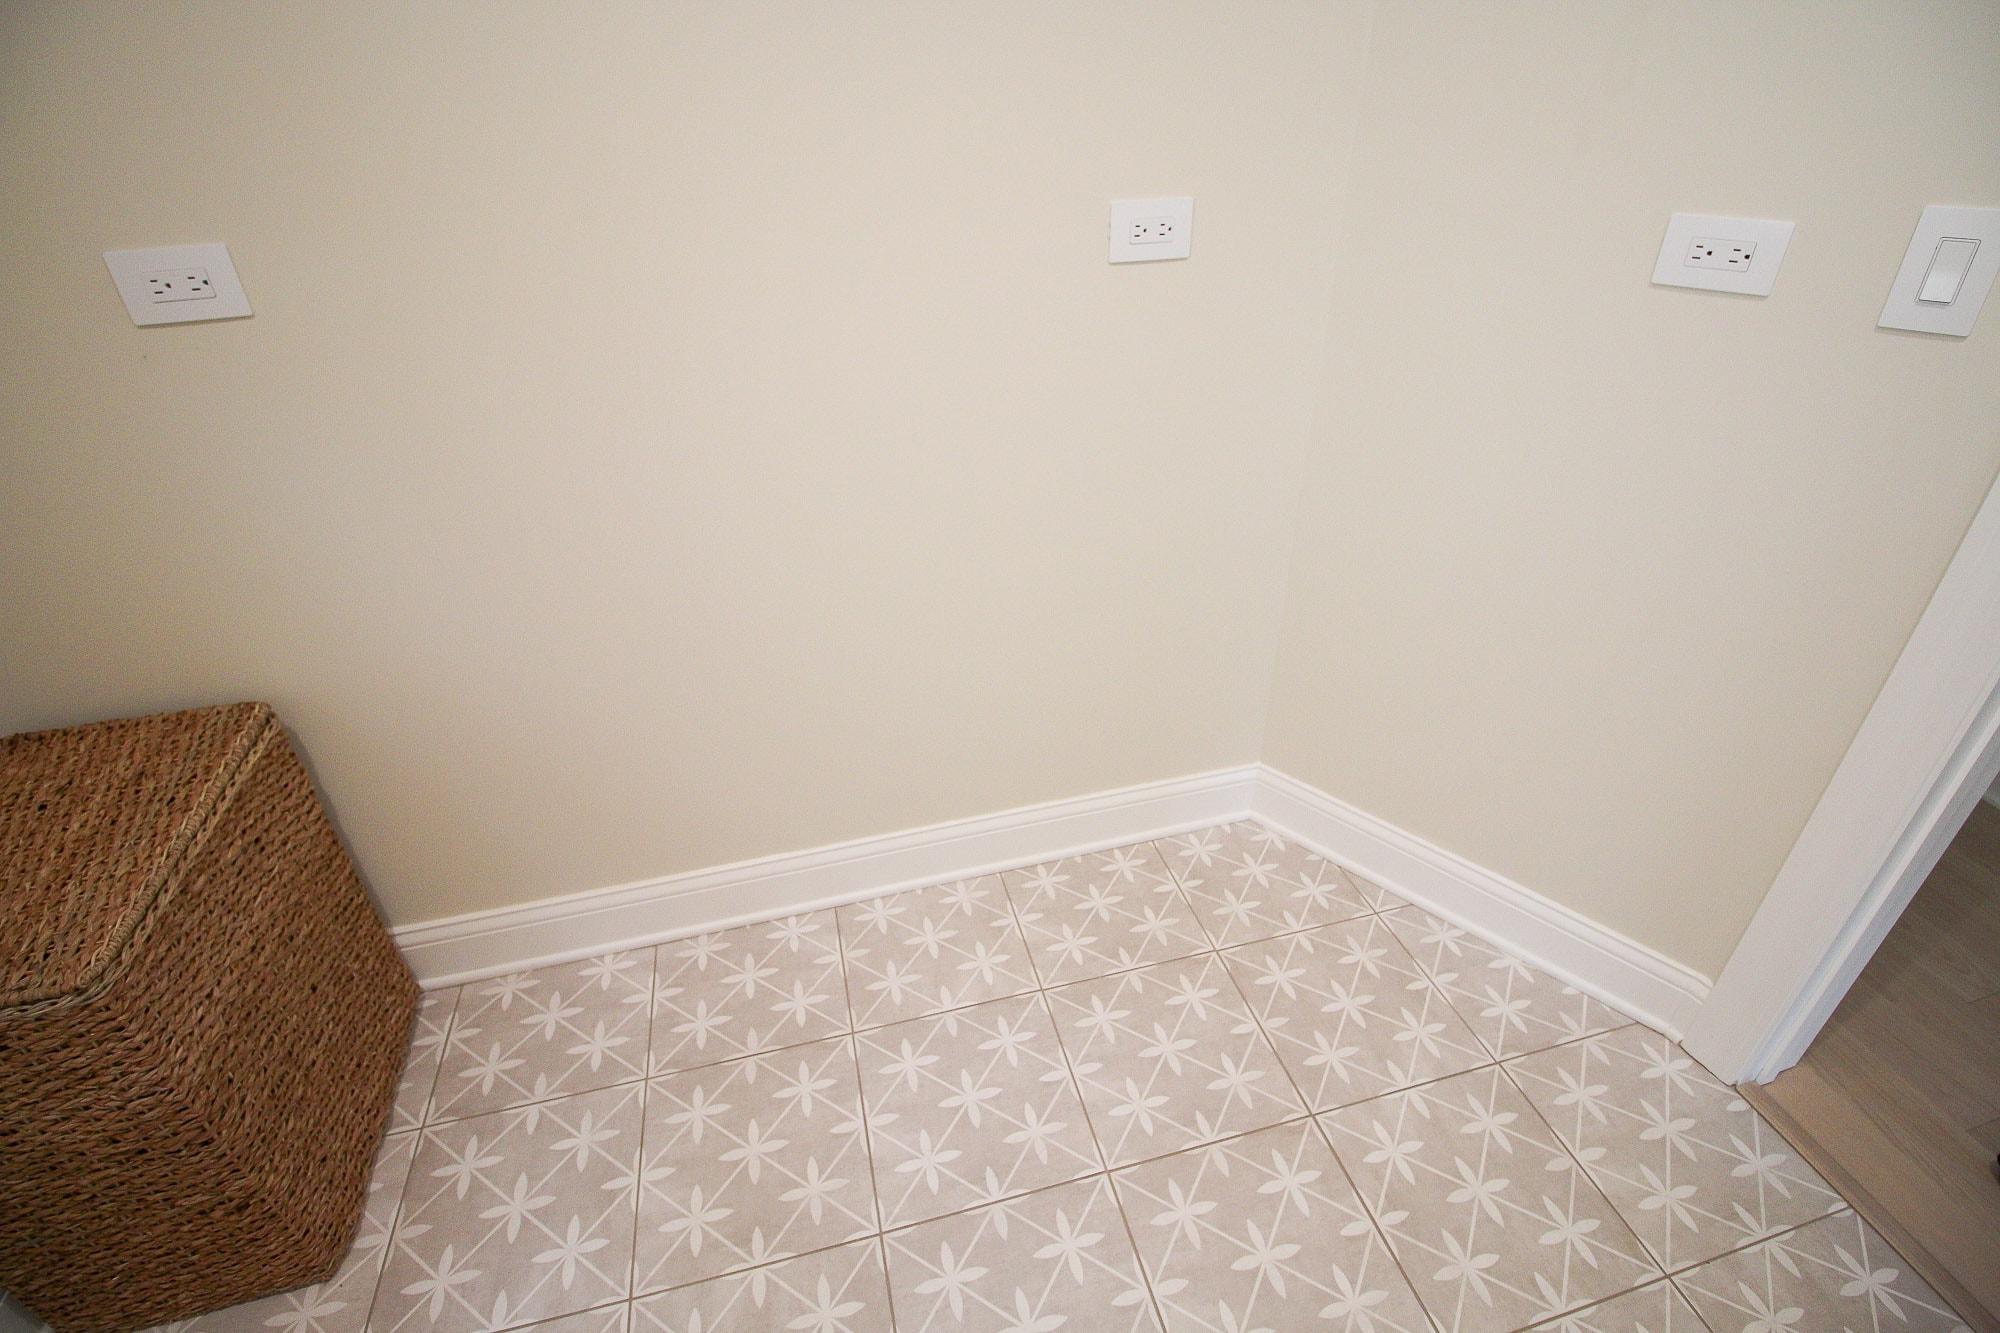 DIY laundry room gameplan